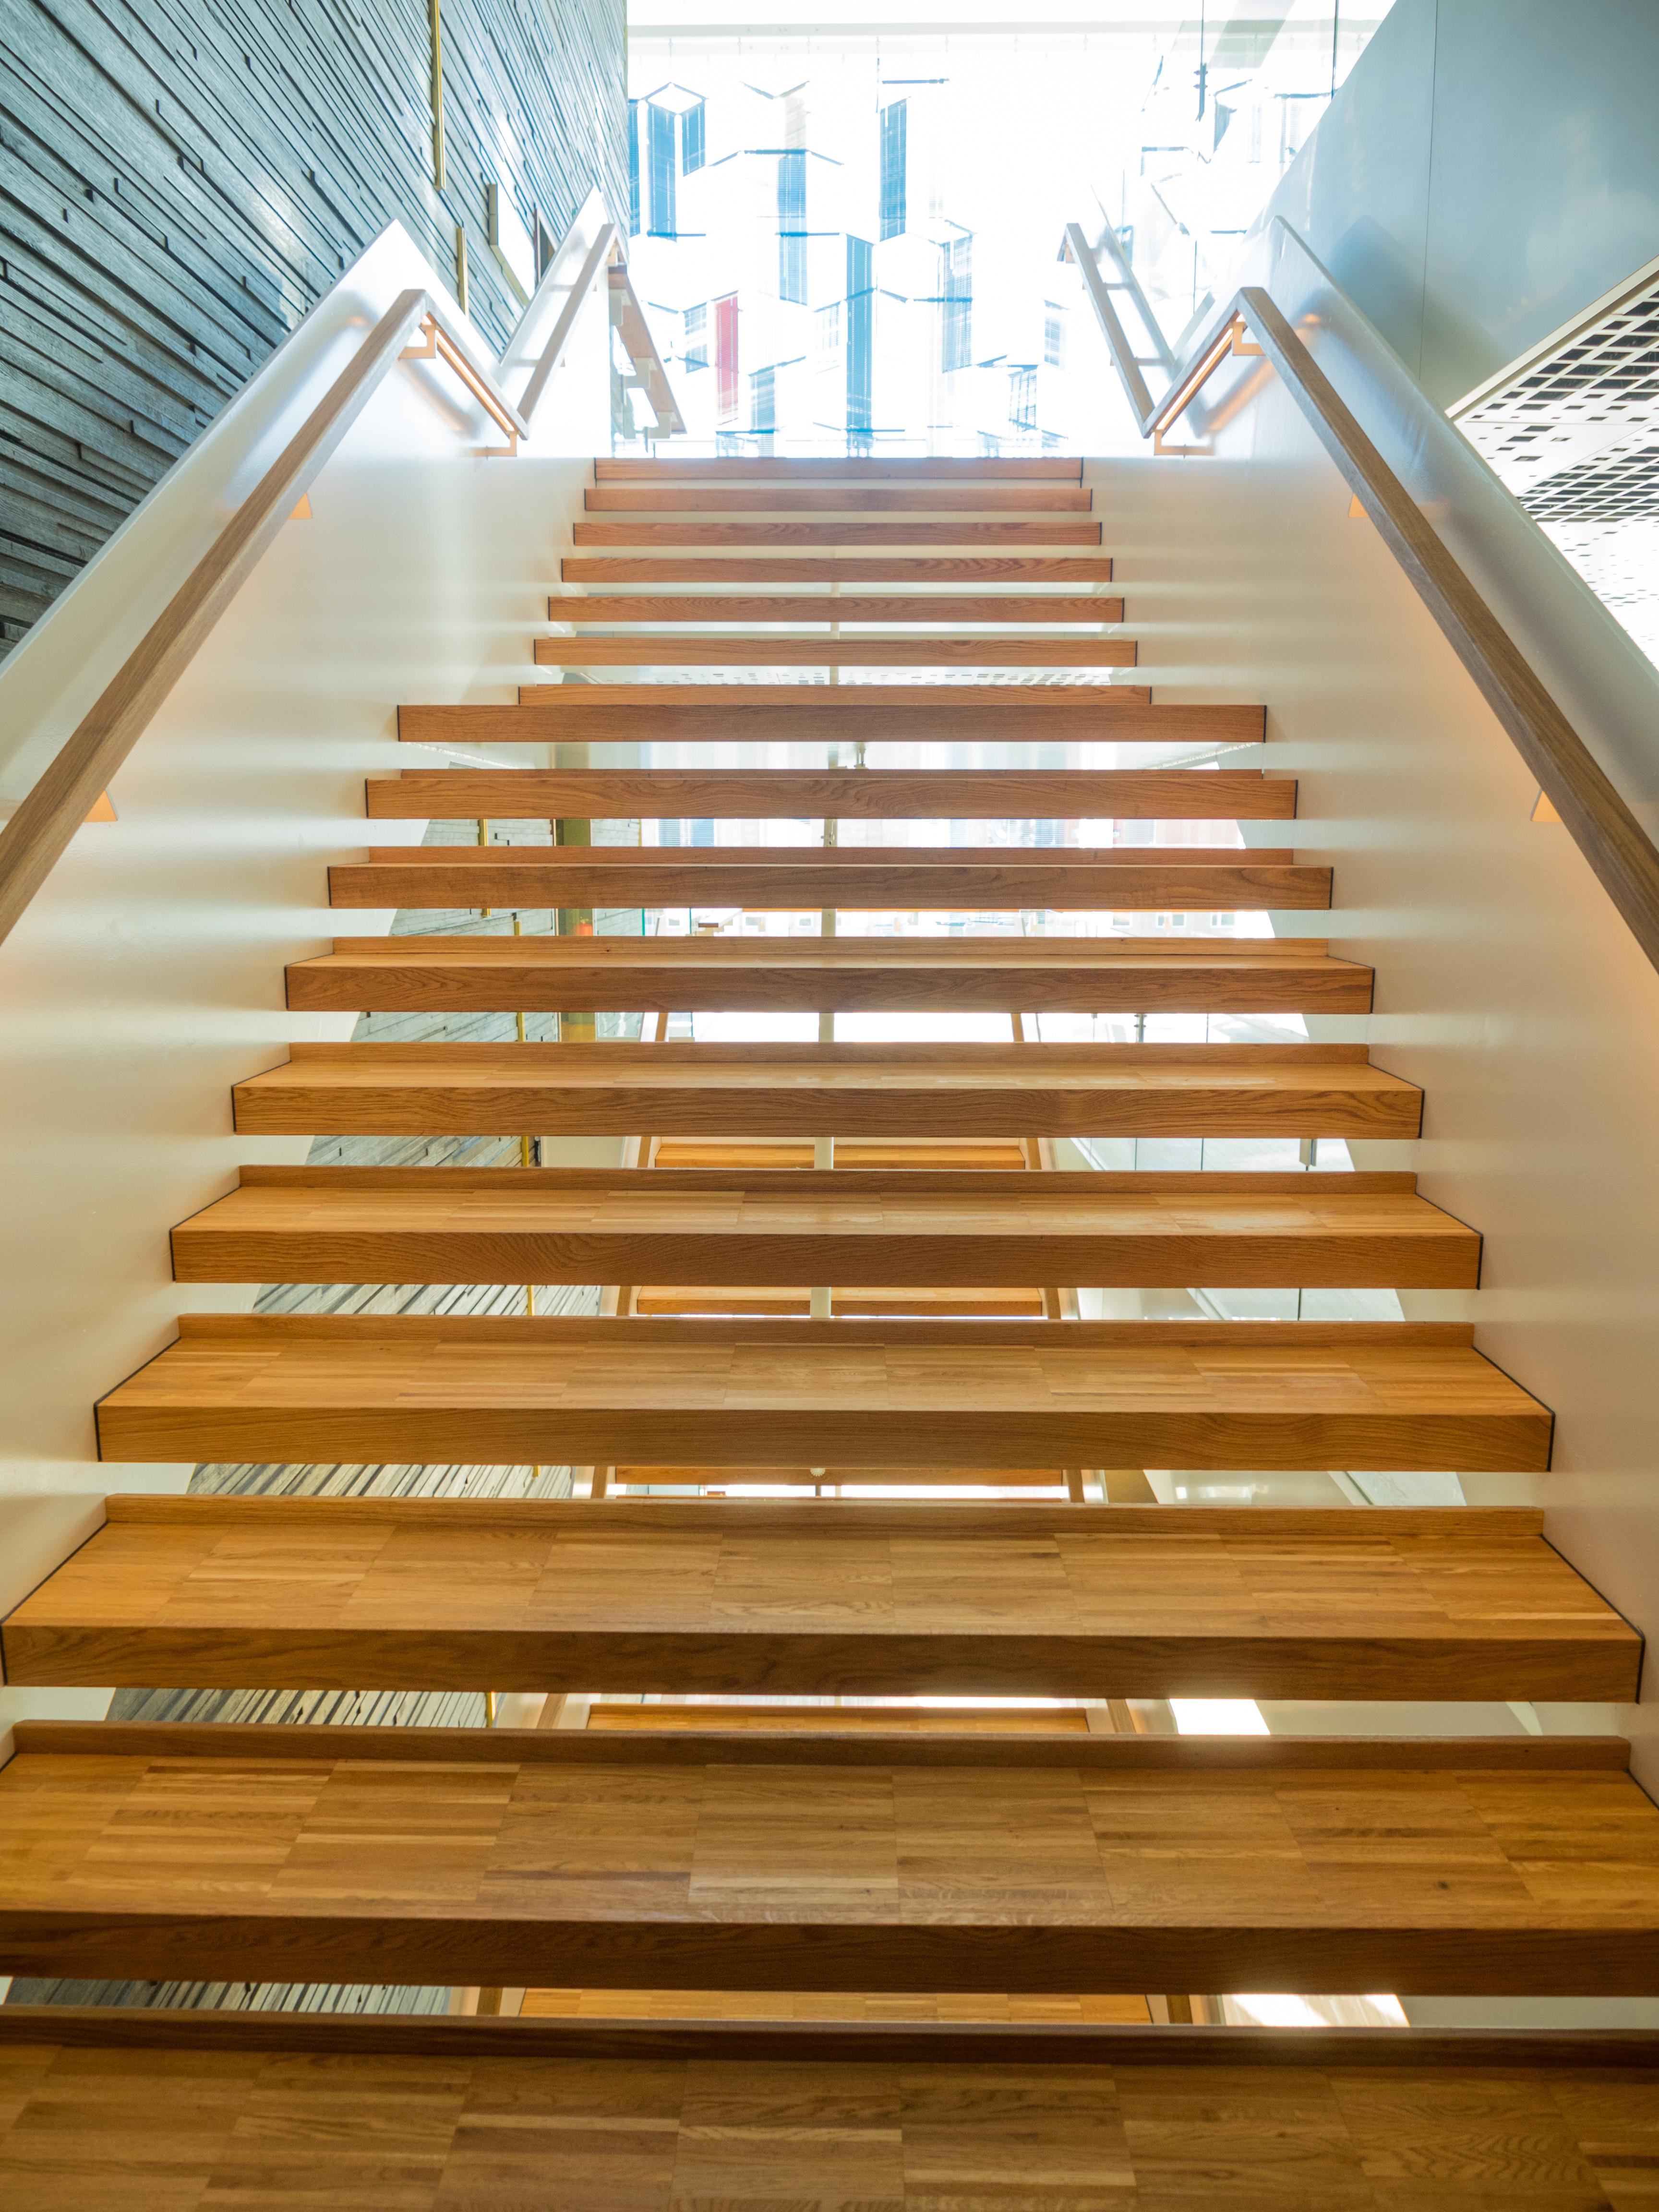 Wallpaper : stairs, interior design, handrail, malmo, floor ...